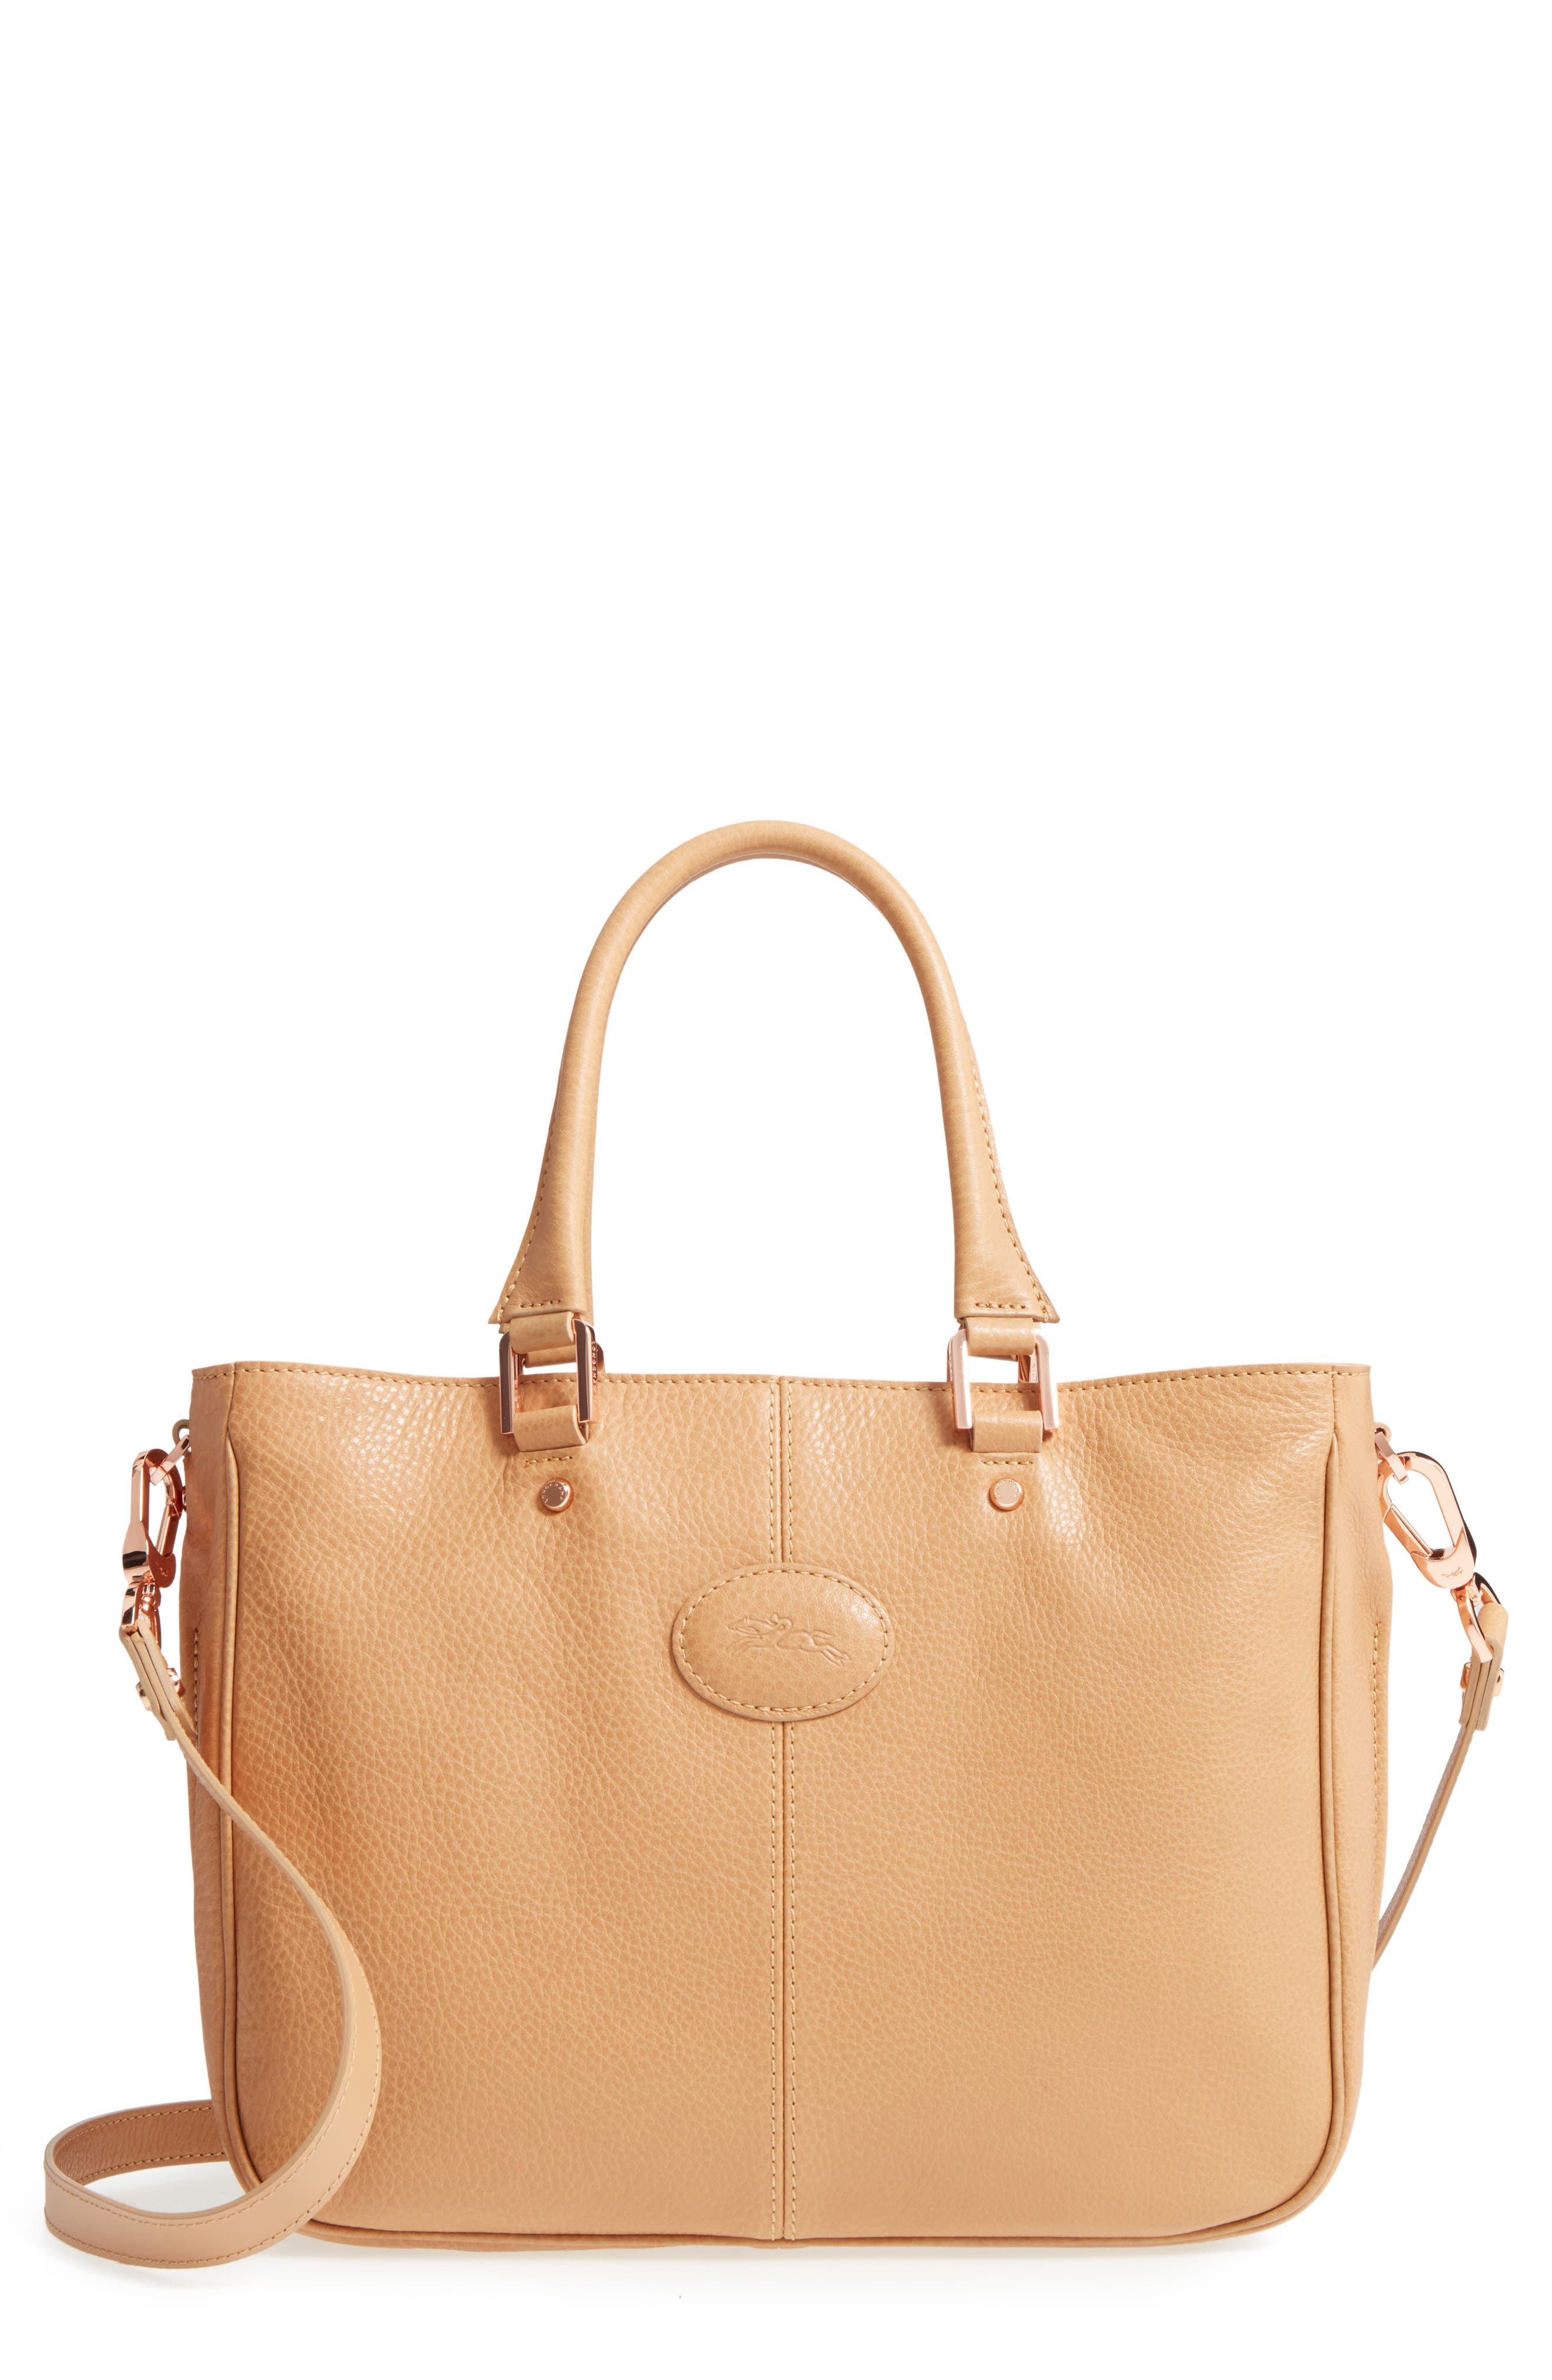 Longchamp Mystery Leather Satchel